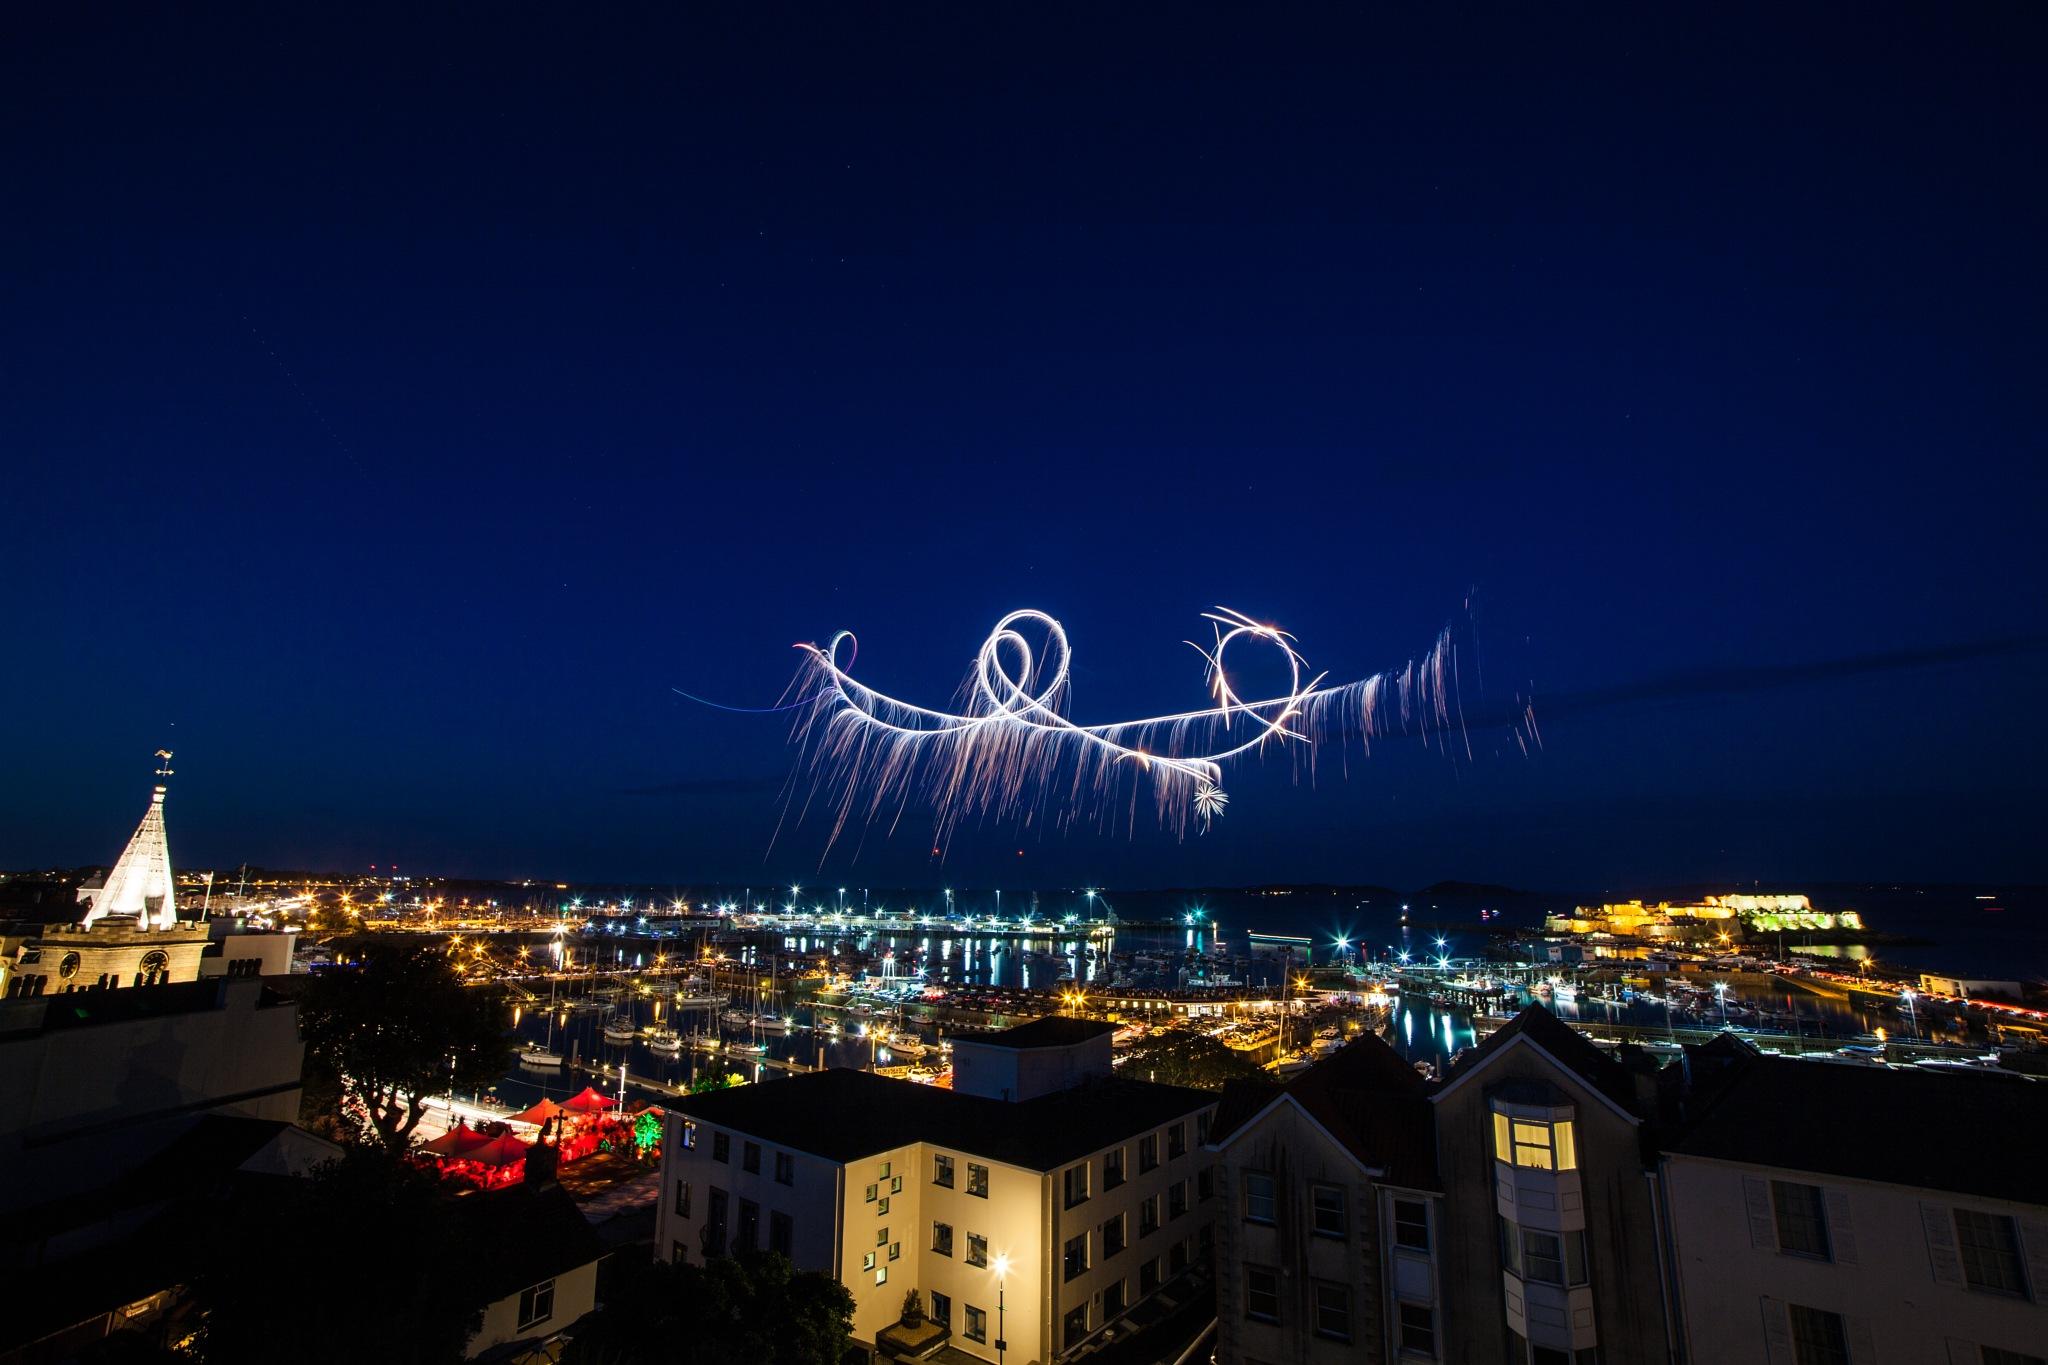 Aerosparx by bryan collenette